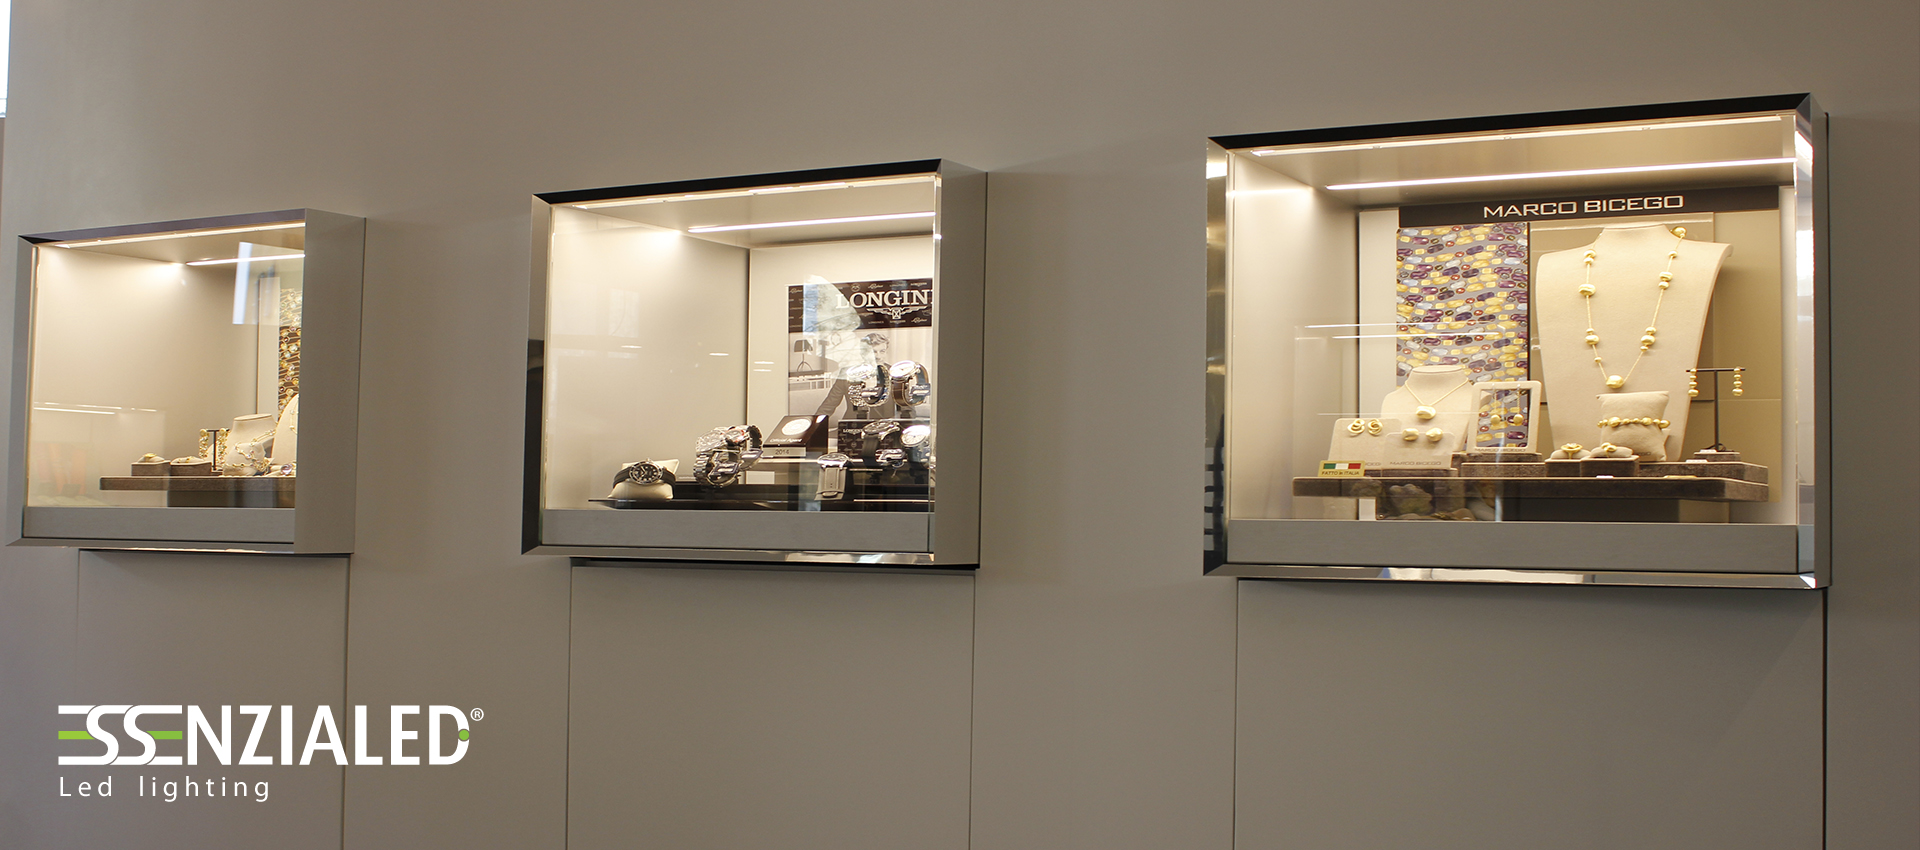 Illuminazione Led per negozi - Made in Italy - EssenzialedEssenzialed – Illum...